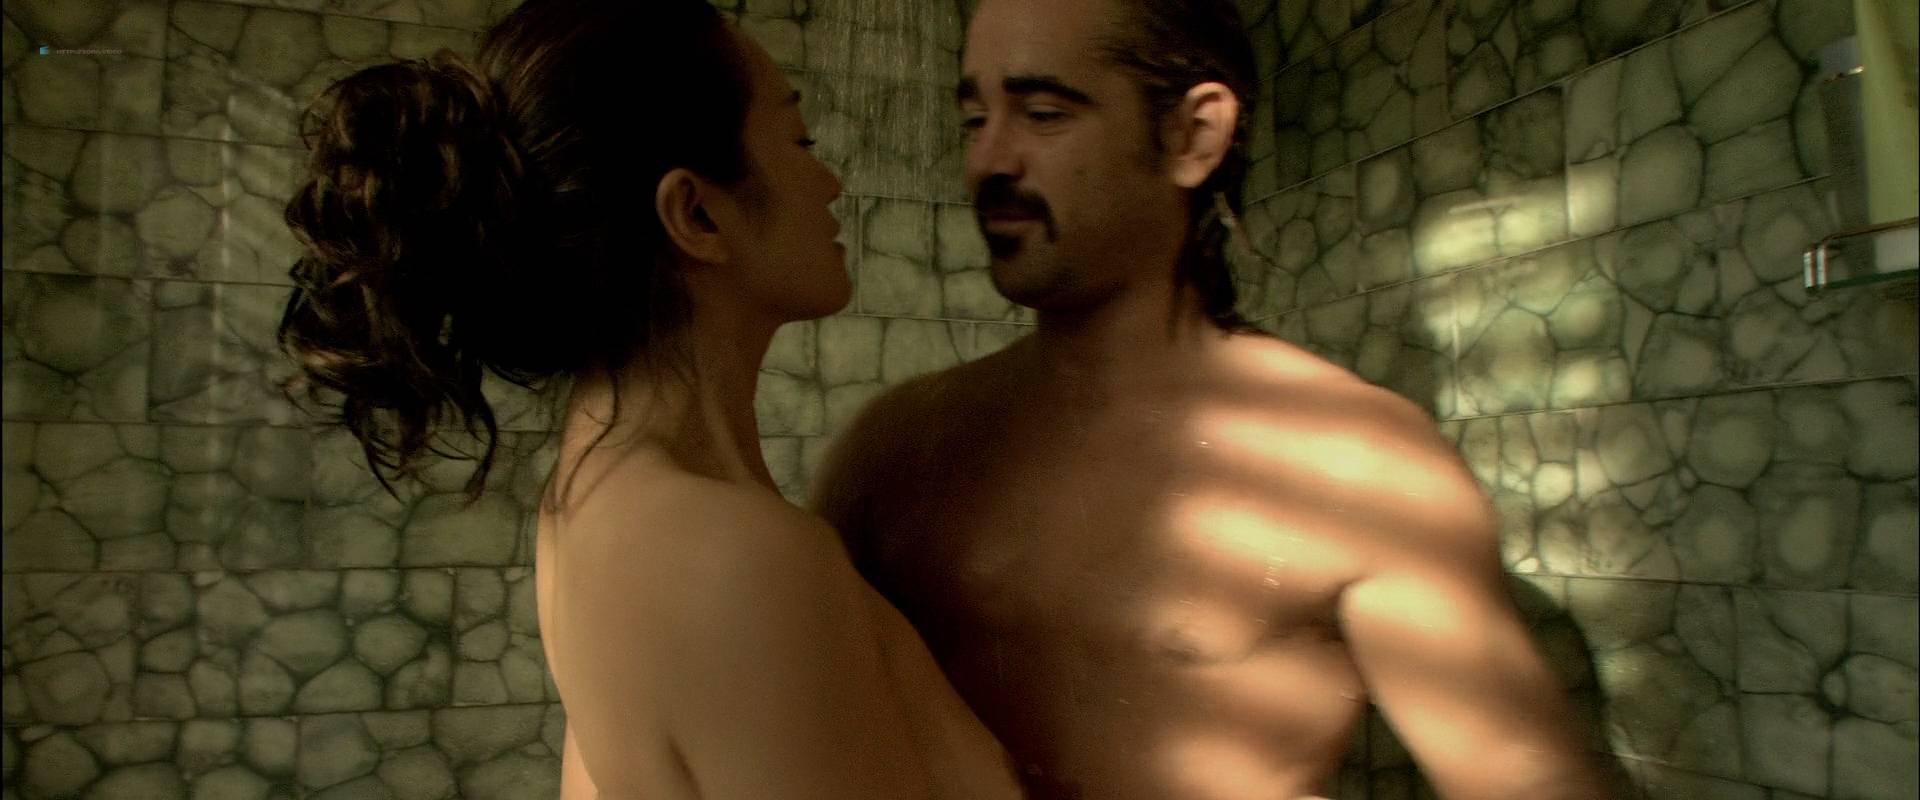 Gong Li Nude Nipple And Naomie Harris Hot Nude Bd - Miami -5216